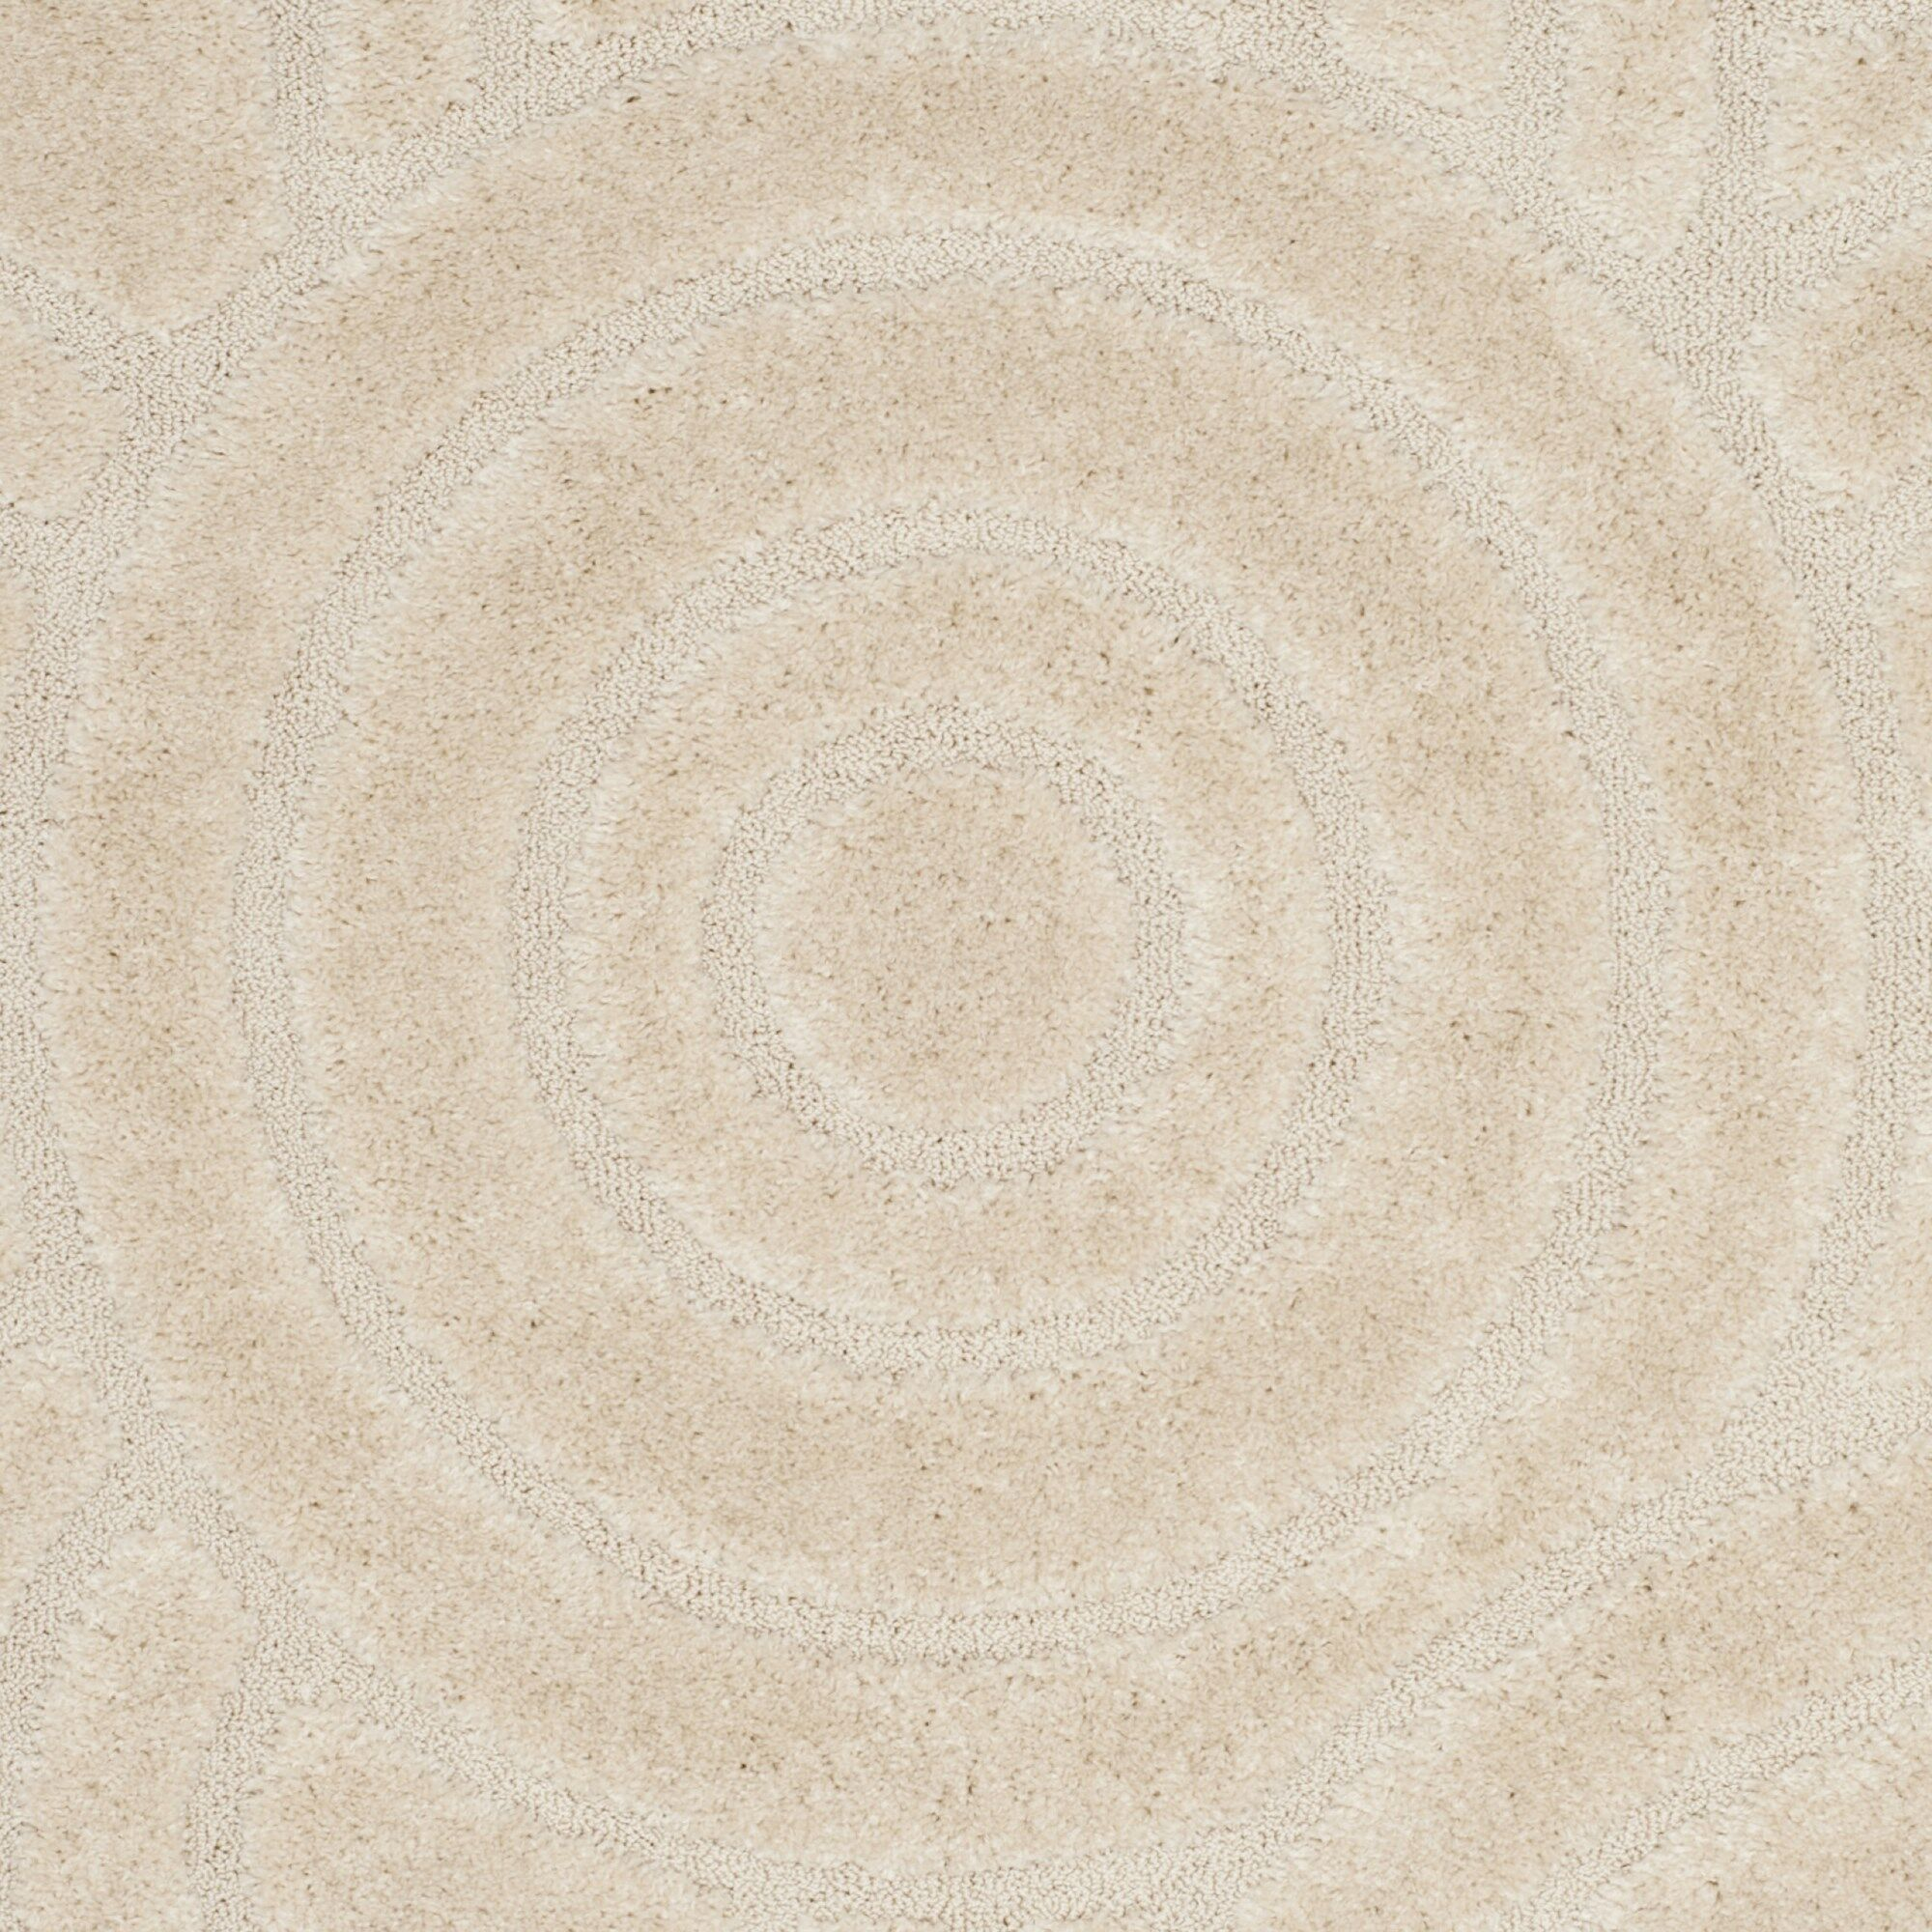 Mckay Cream Area Rug Rug Size: Rectangle 9' x 12'